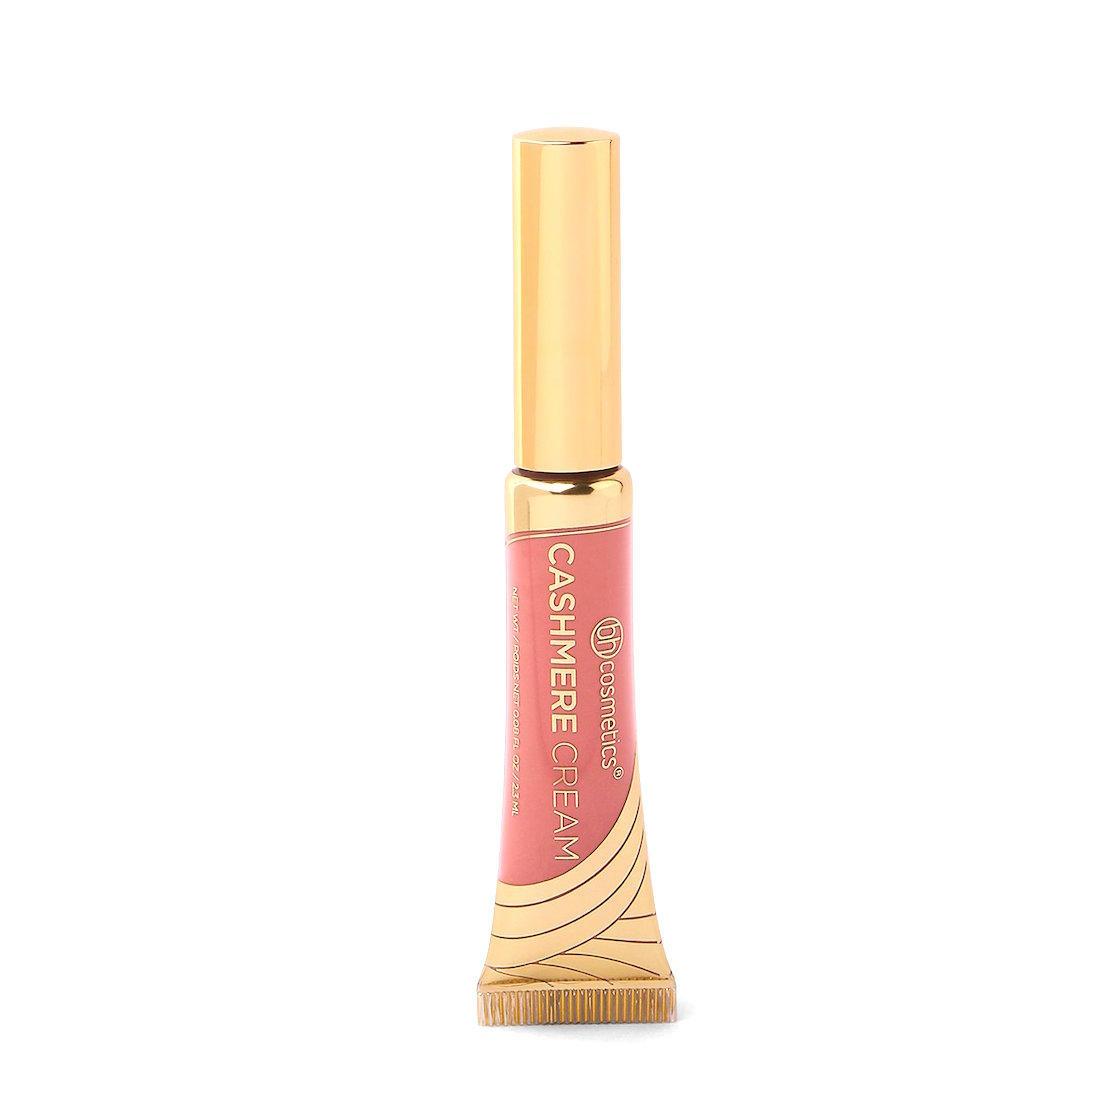 BH Cosmetics Cashmere Cream Comfort Lipstick Perf